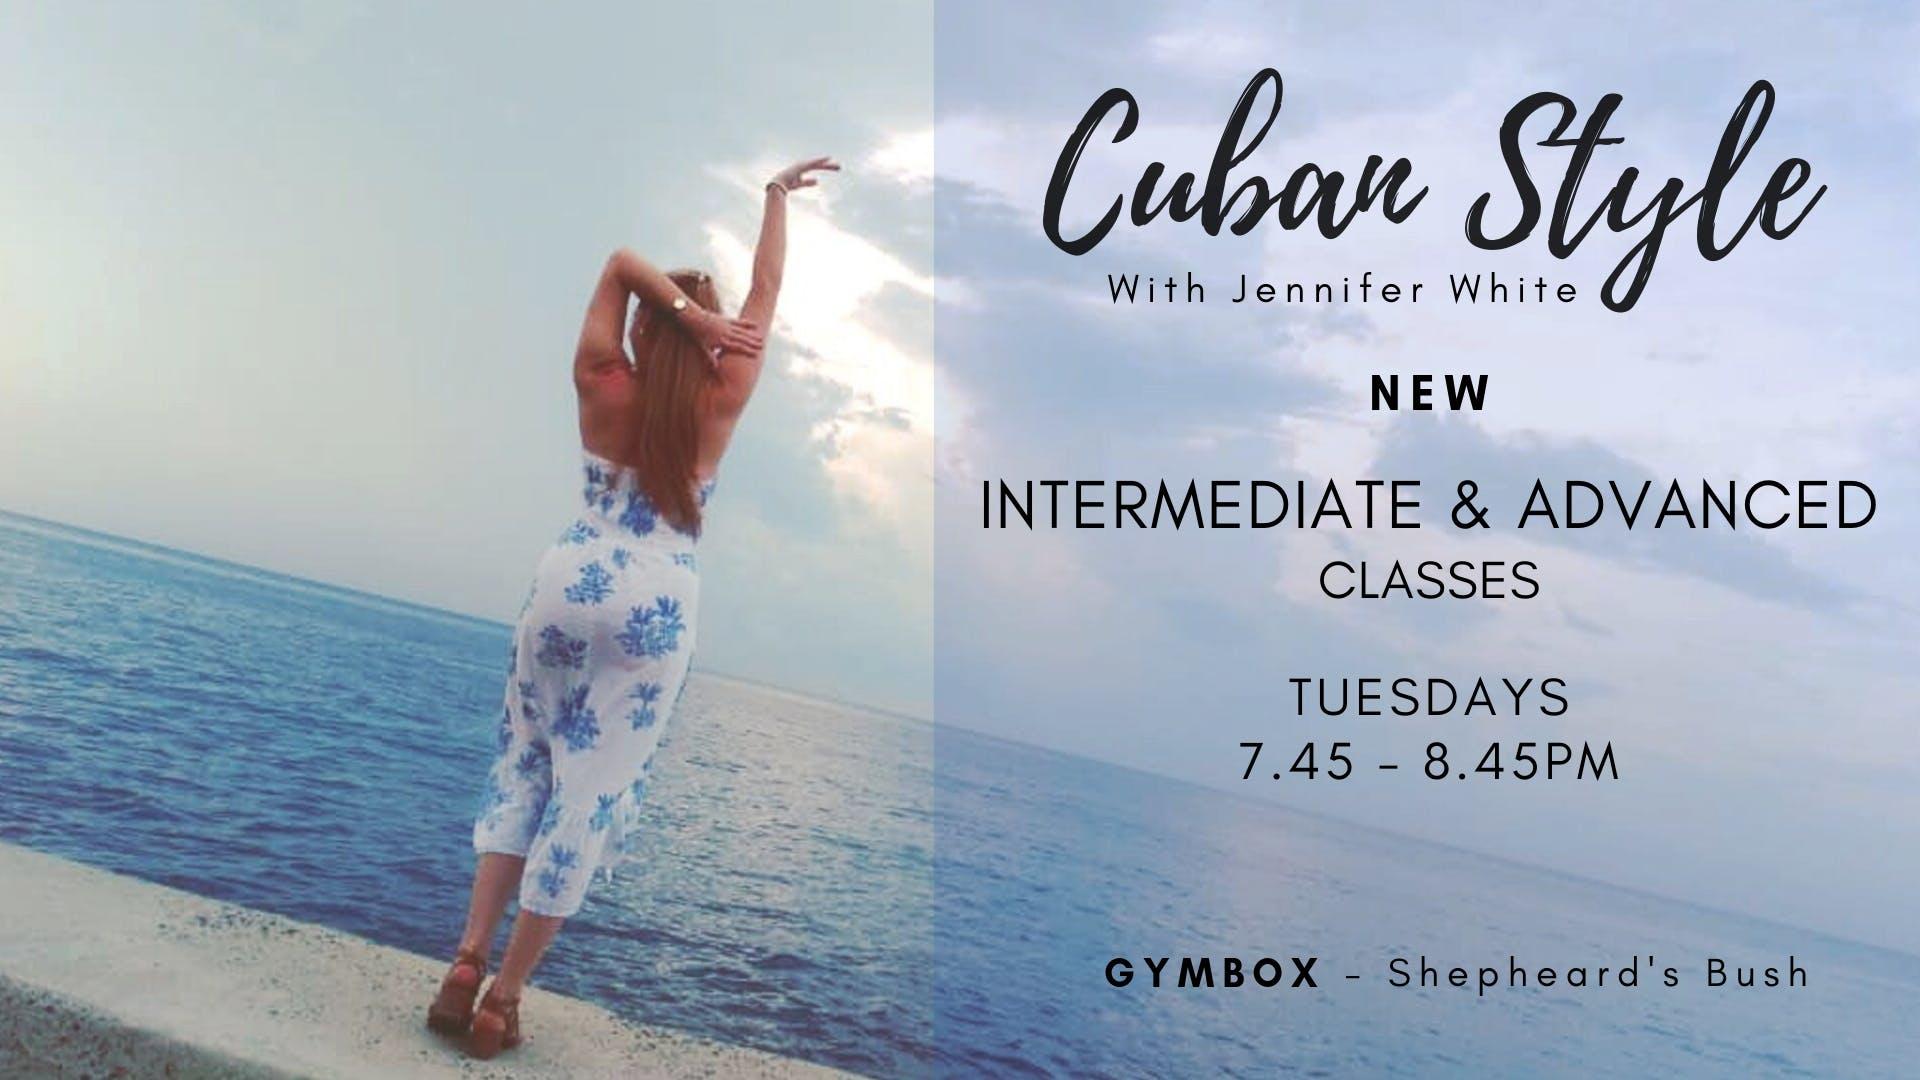 AUTUMN EDITION - Ladies Cuban Styling - Intermediate & Advanced